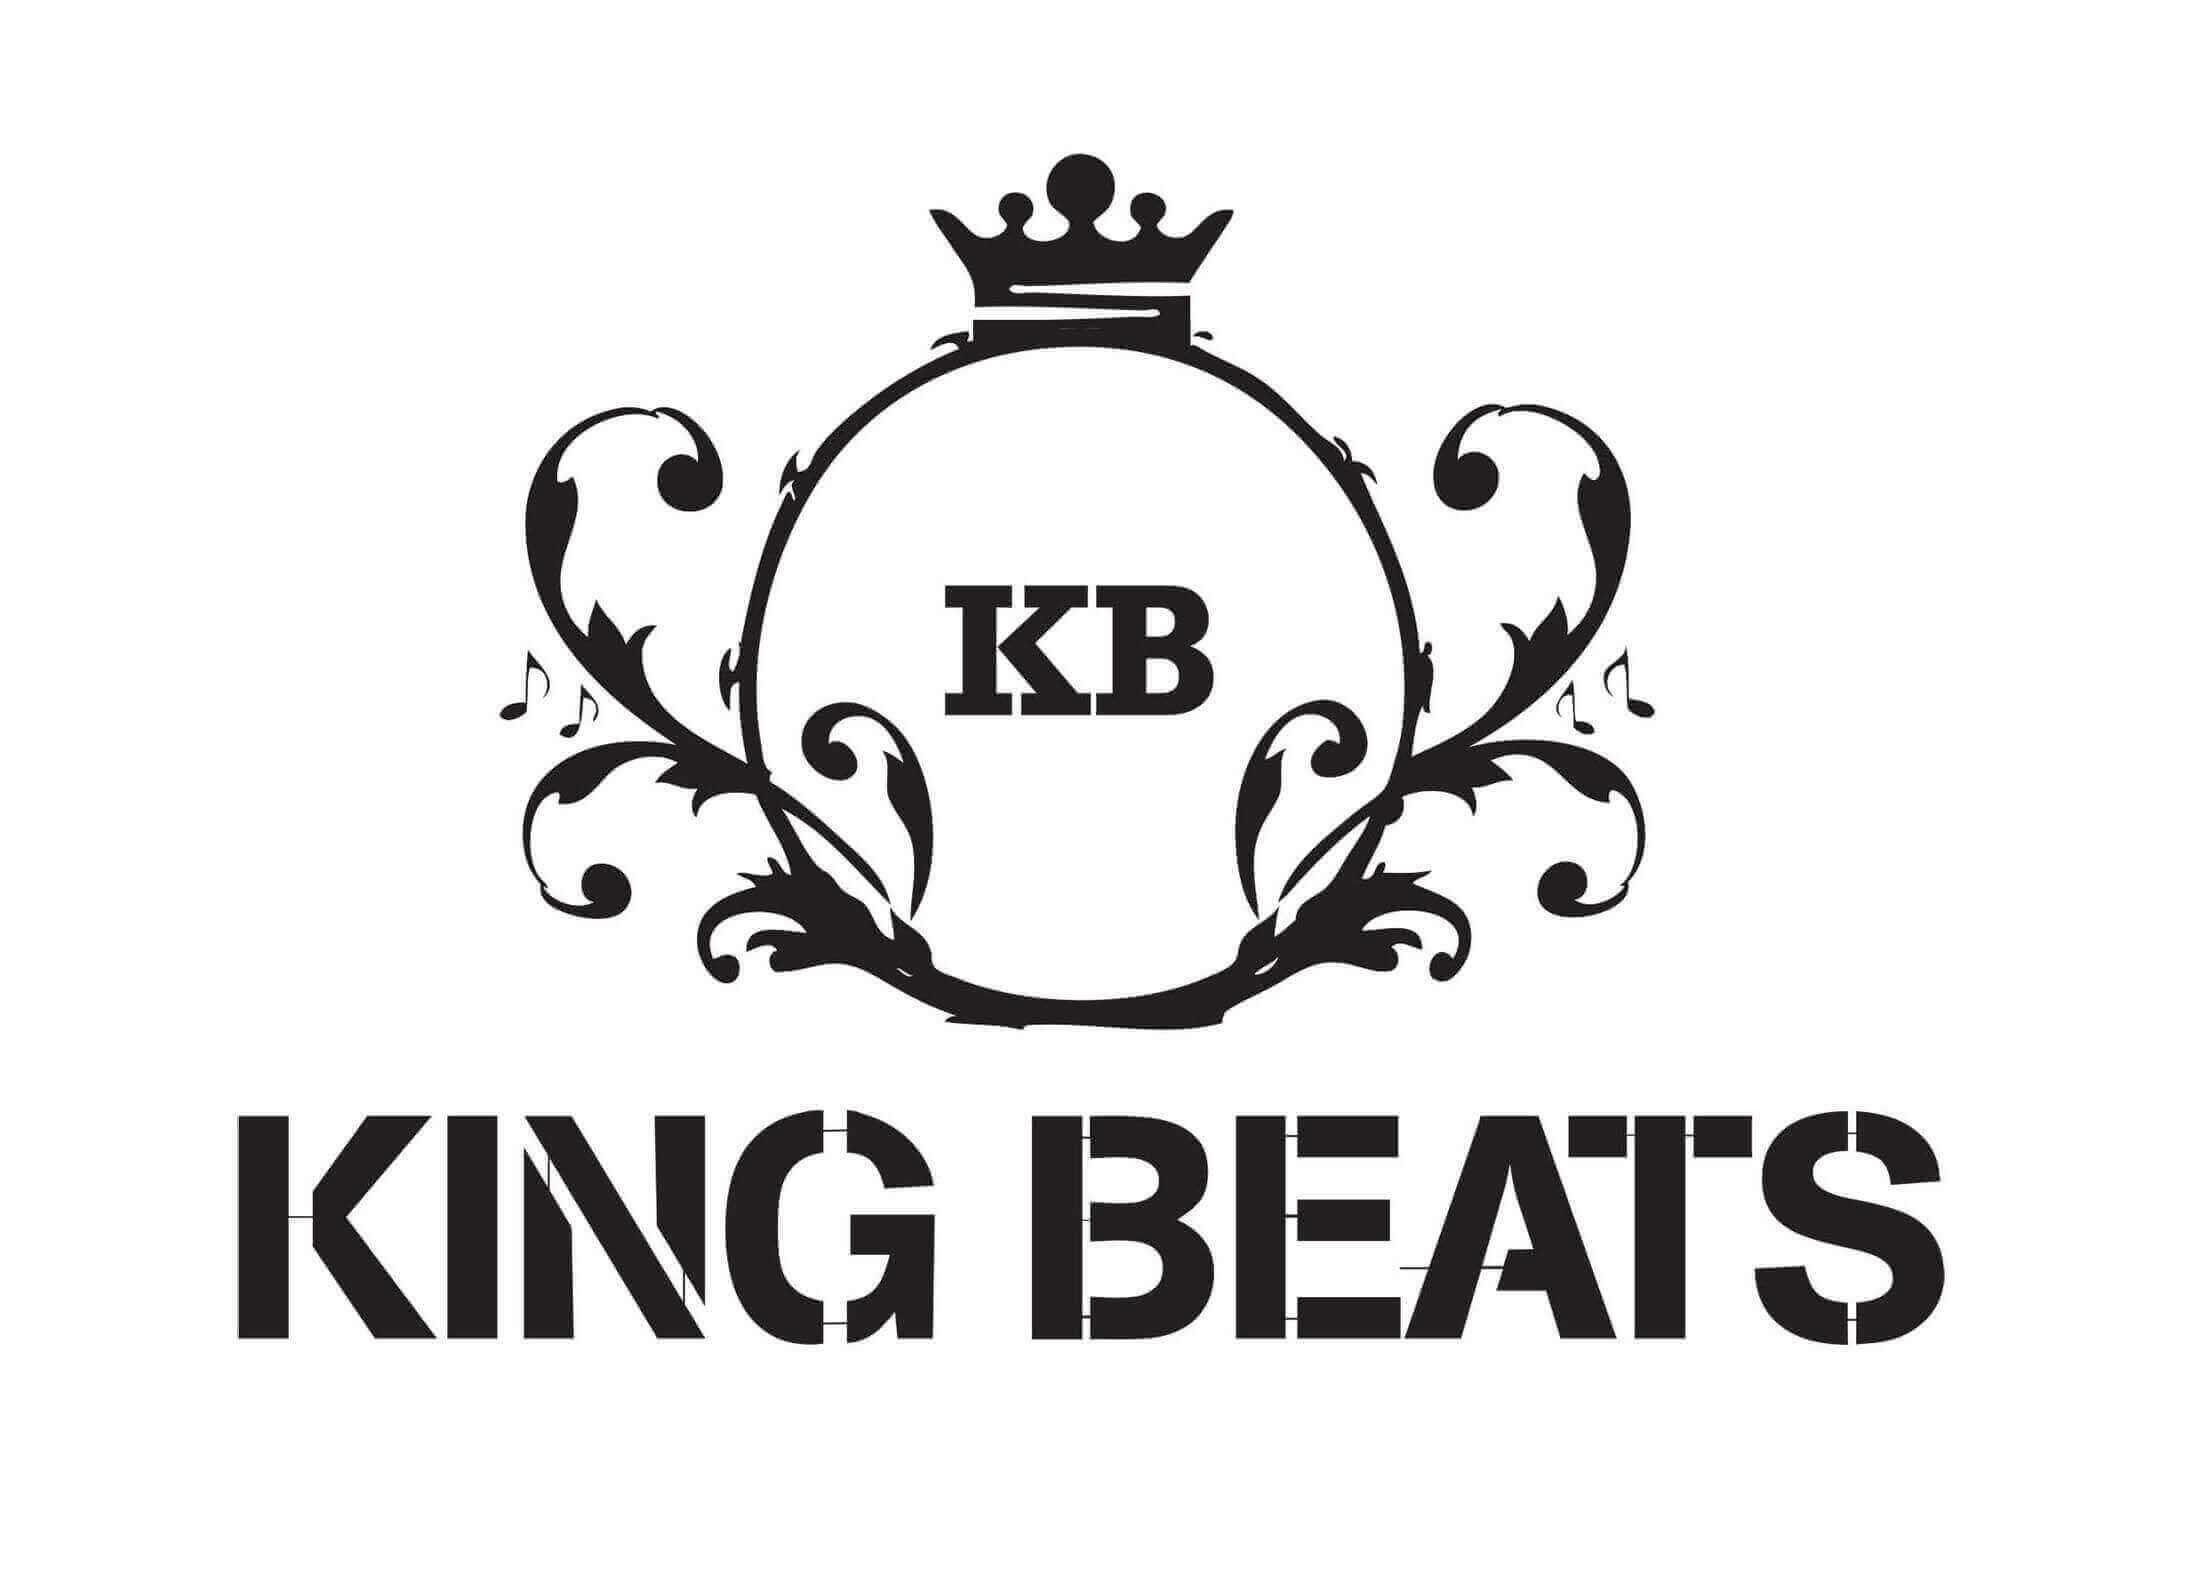 King Beats.jpg Logo